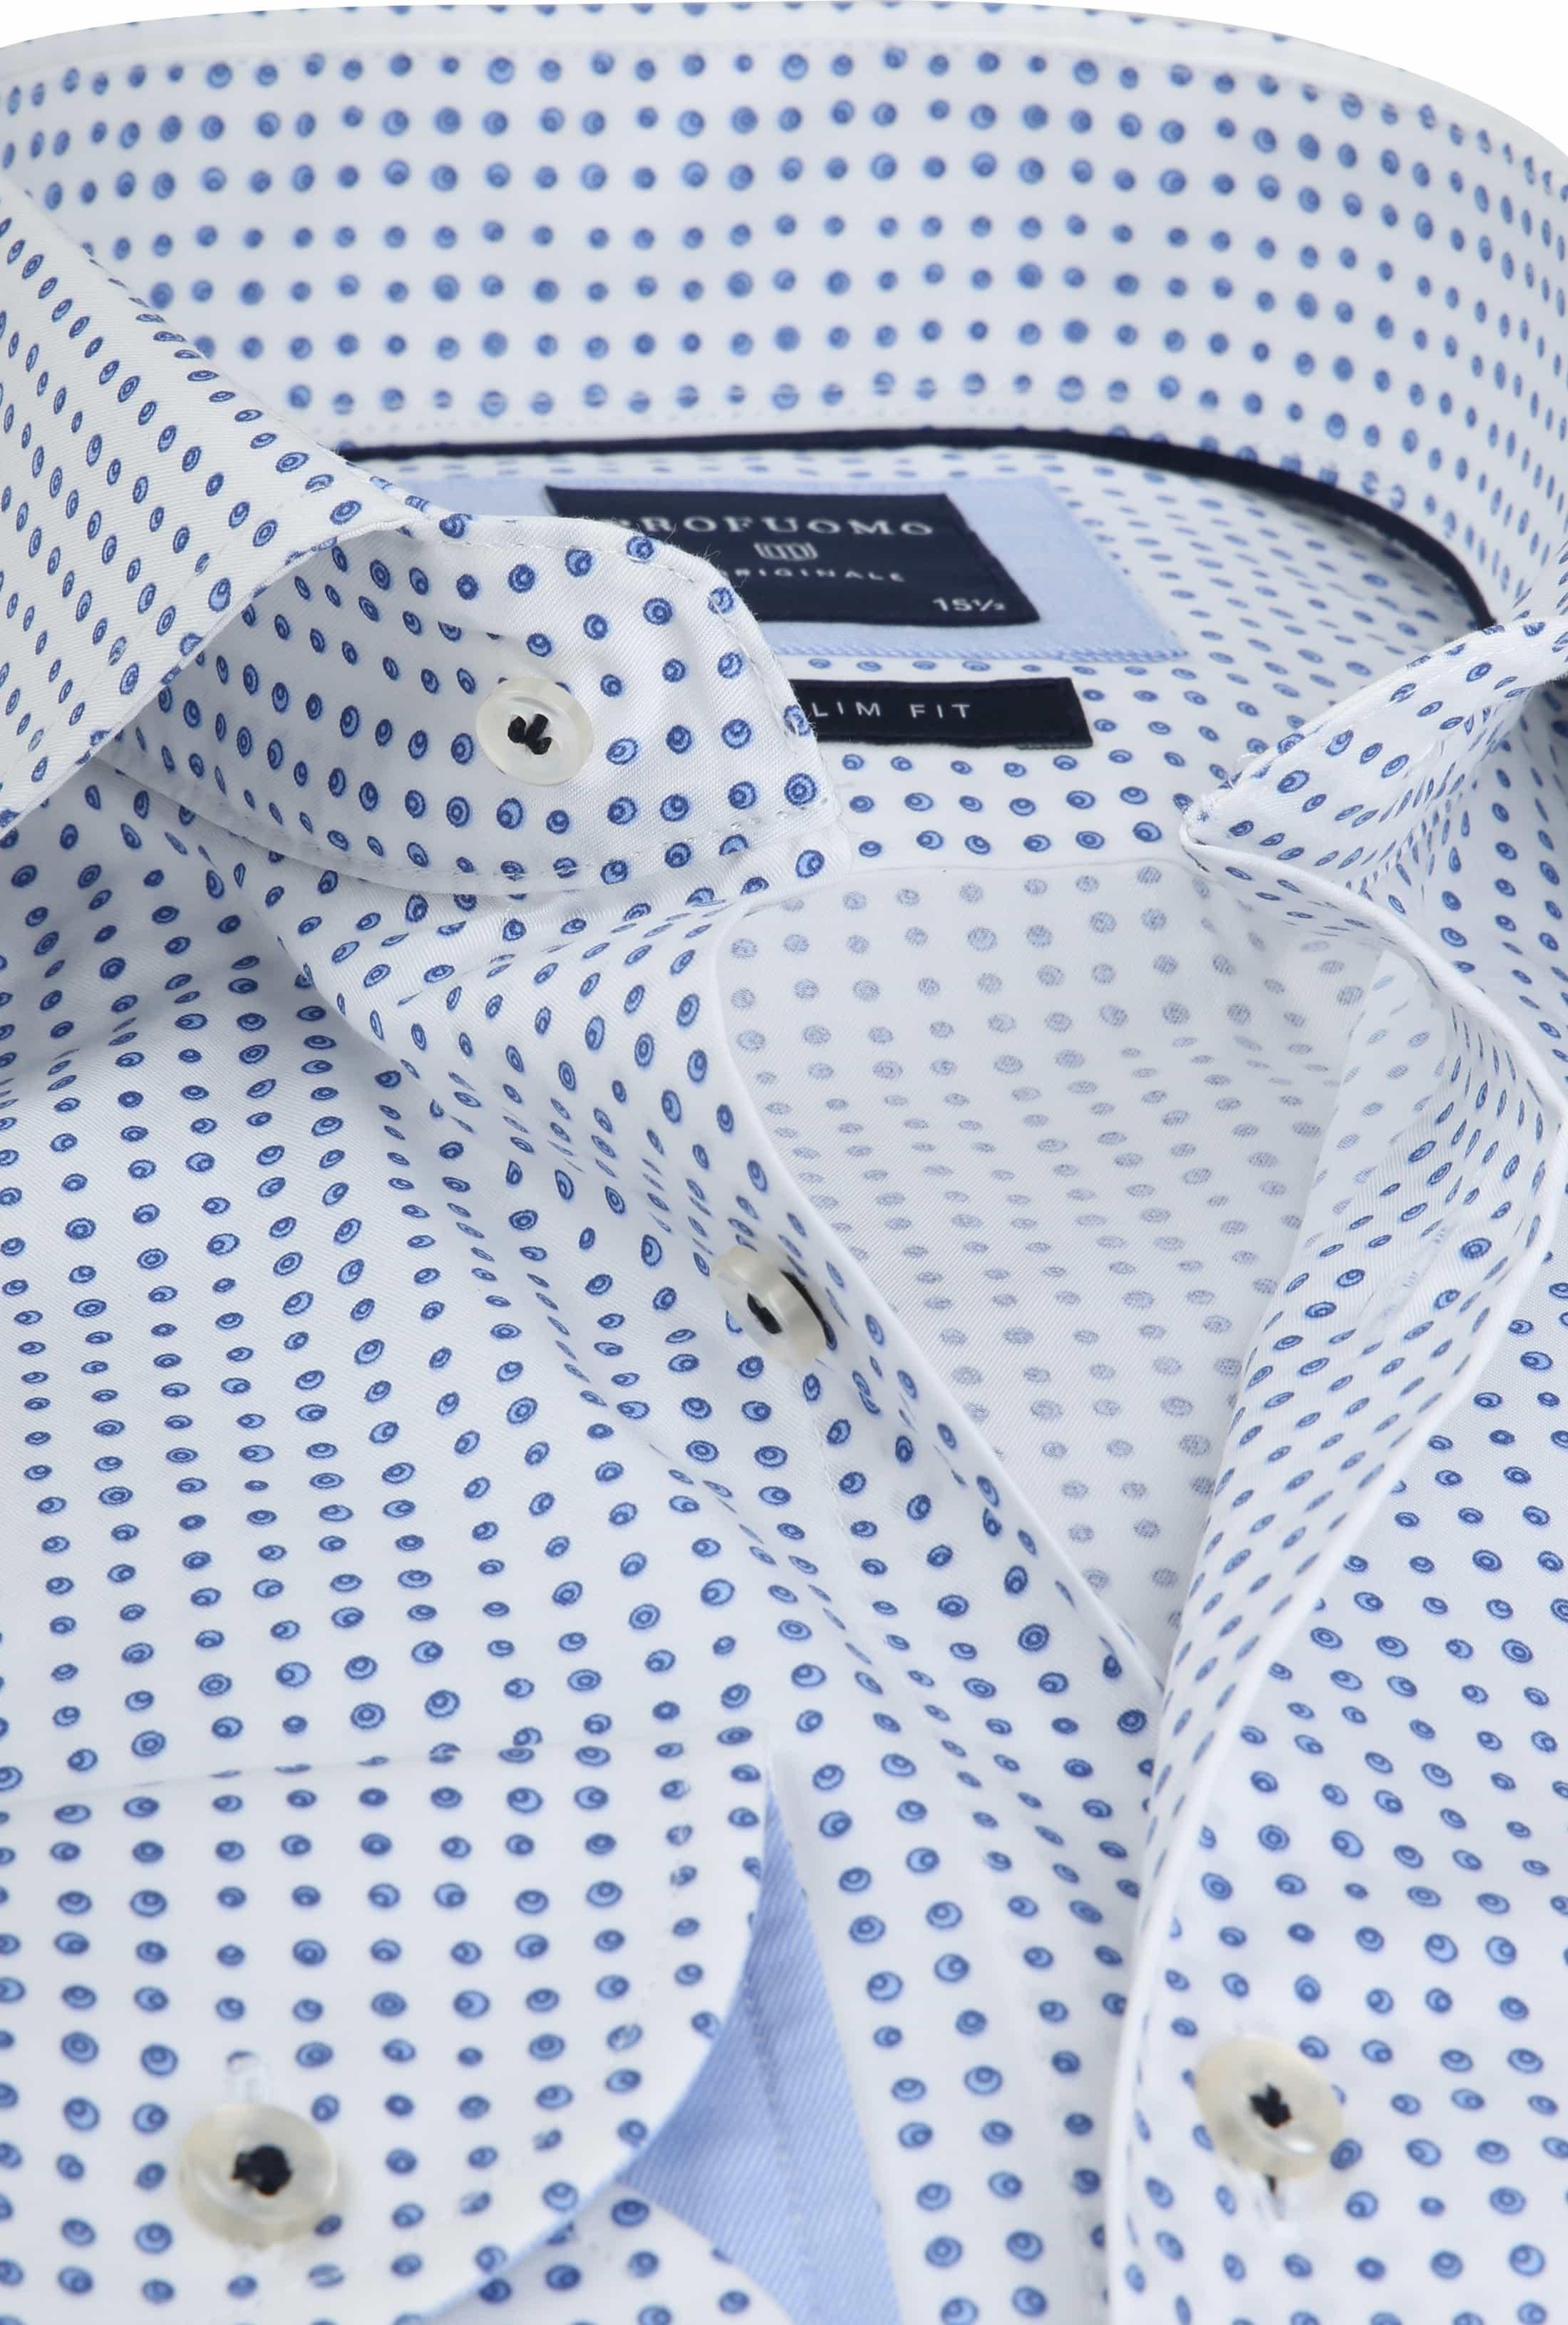 Profuomo Overhemd Stippen Blauw foto 1